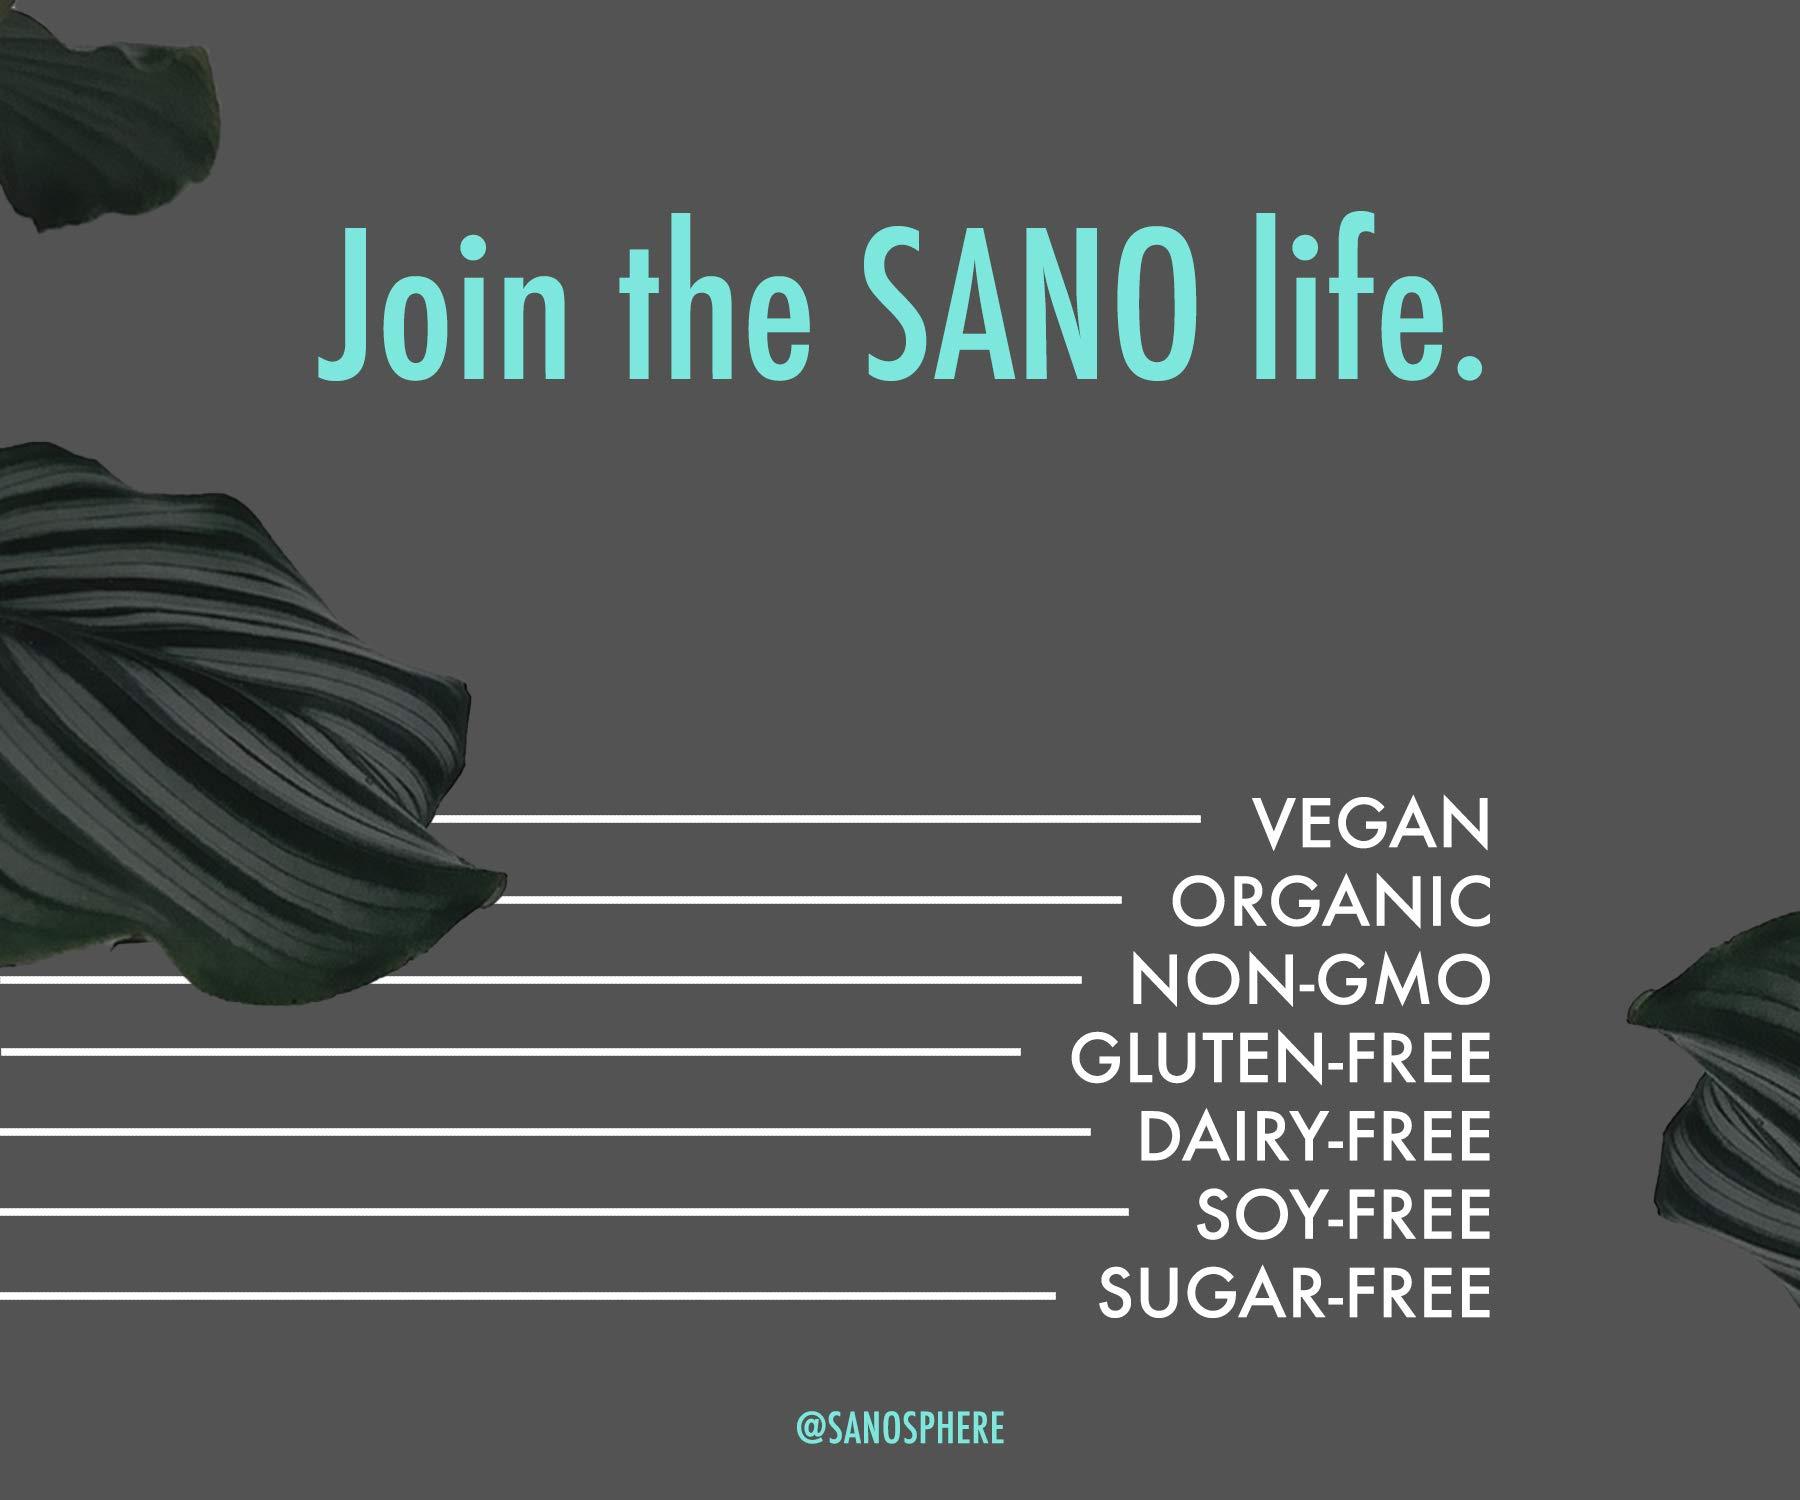 SANO Organic Plant Based Protein Powder, Vanilla (28 Single Servings), Vegan, Organic, Non GMO, Gluten Free, Dairy Free, Sugar Free (Packaging May Vary)